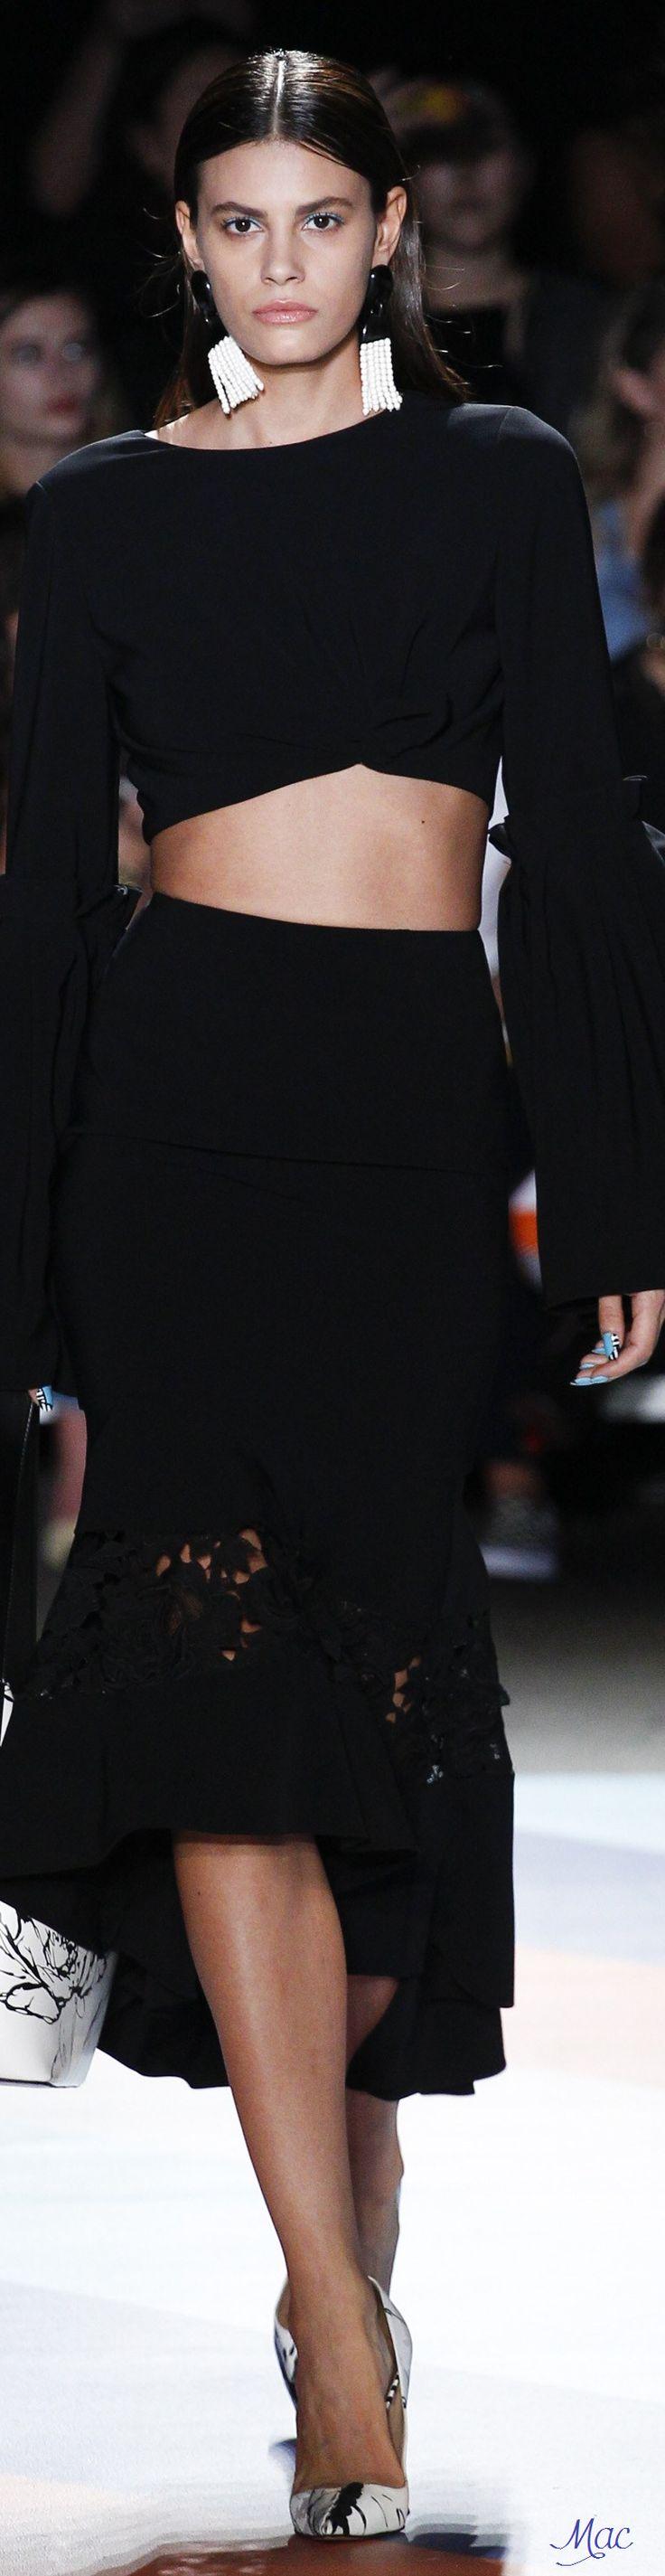 Spring 2017 Ready-to-Wear Christian Siriano